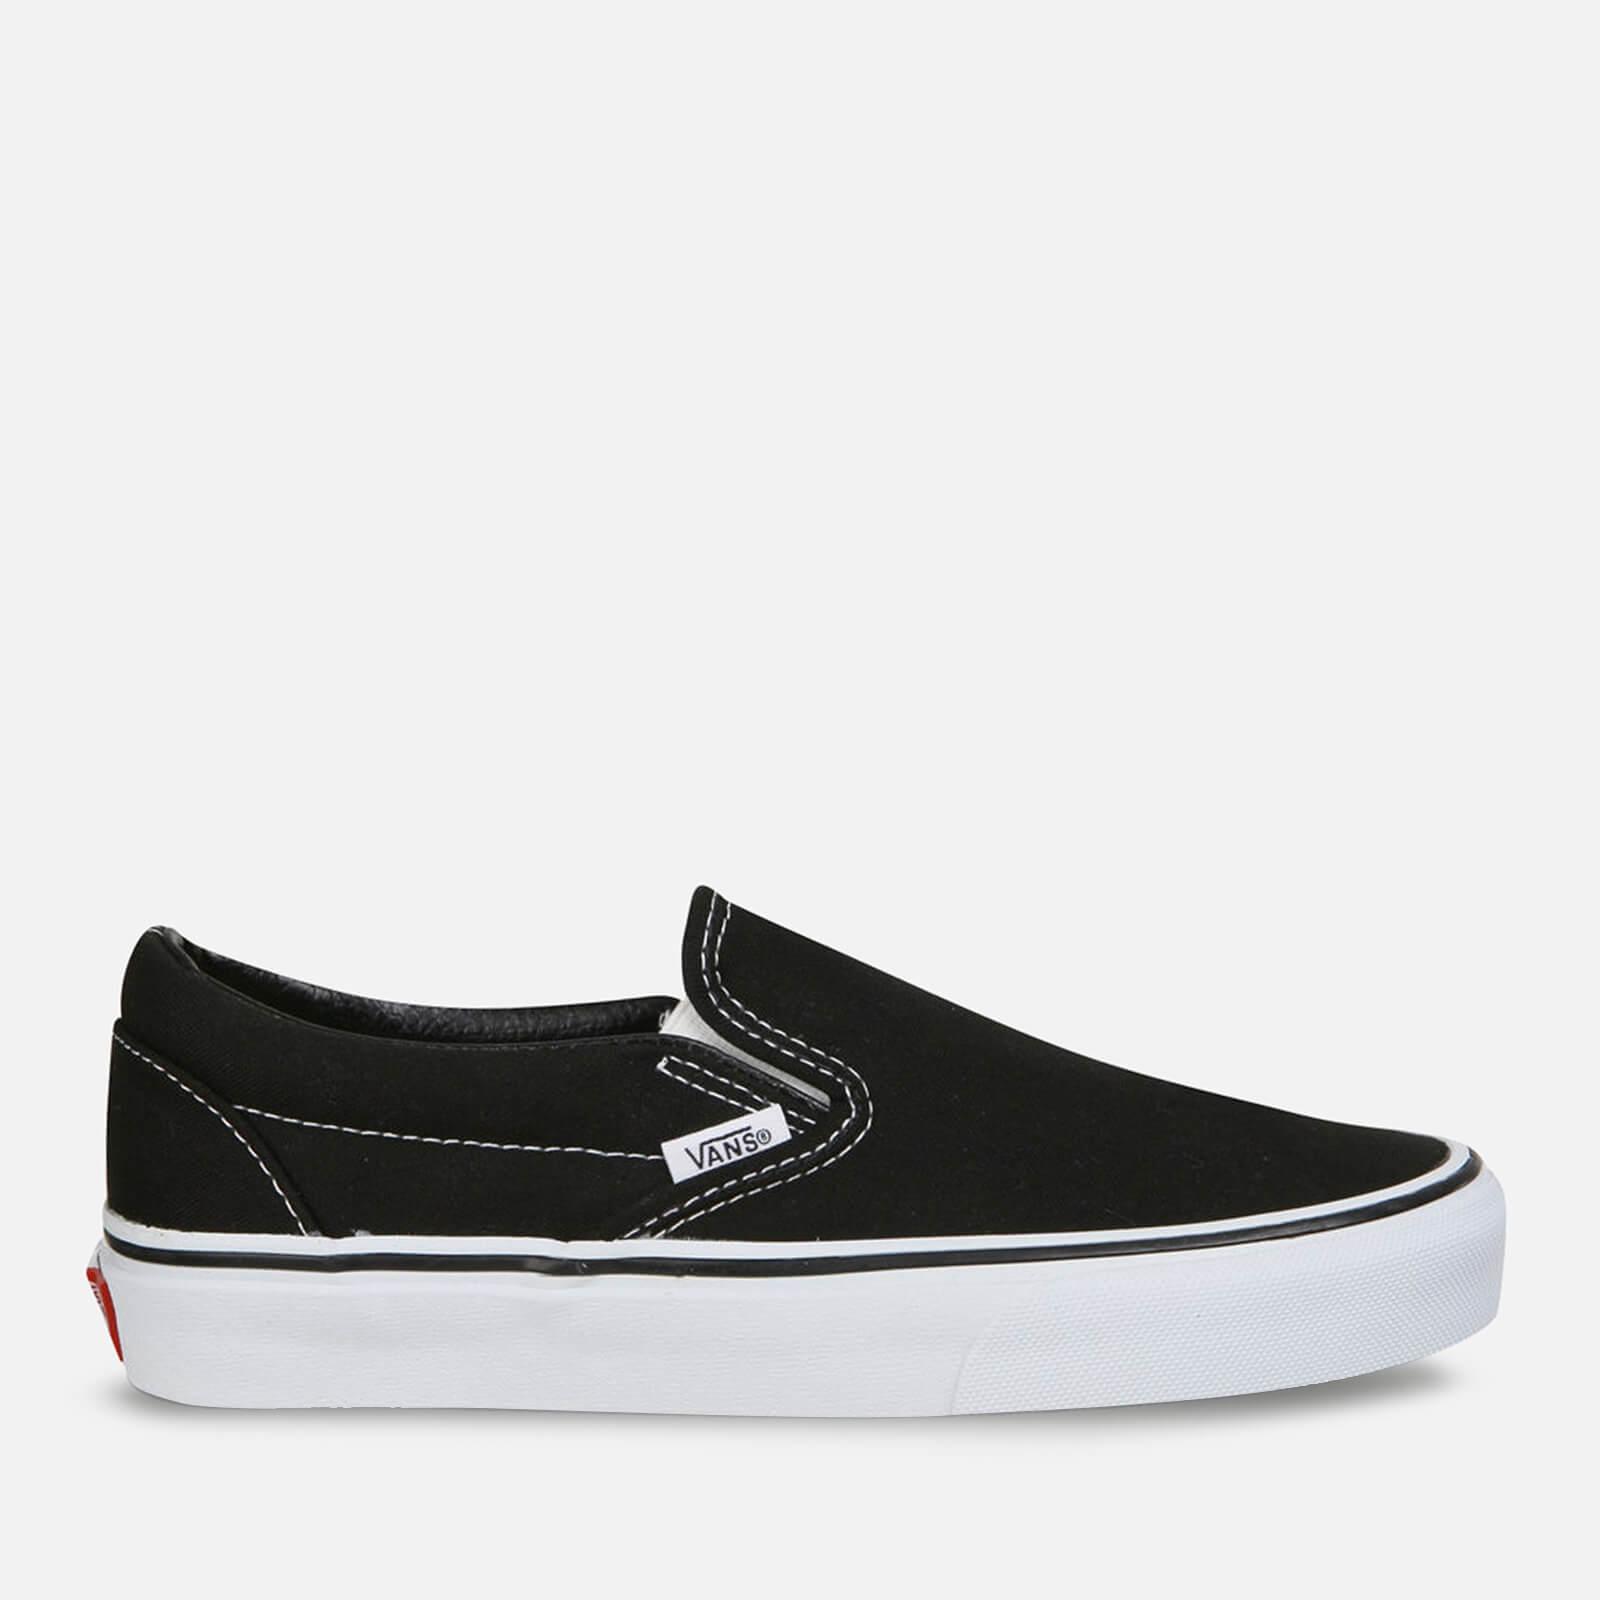 fa96042aeaa Vans Classic Slip-On Trainers - Black